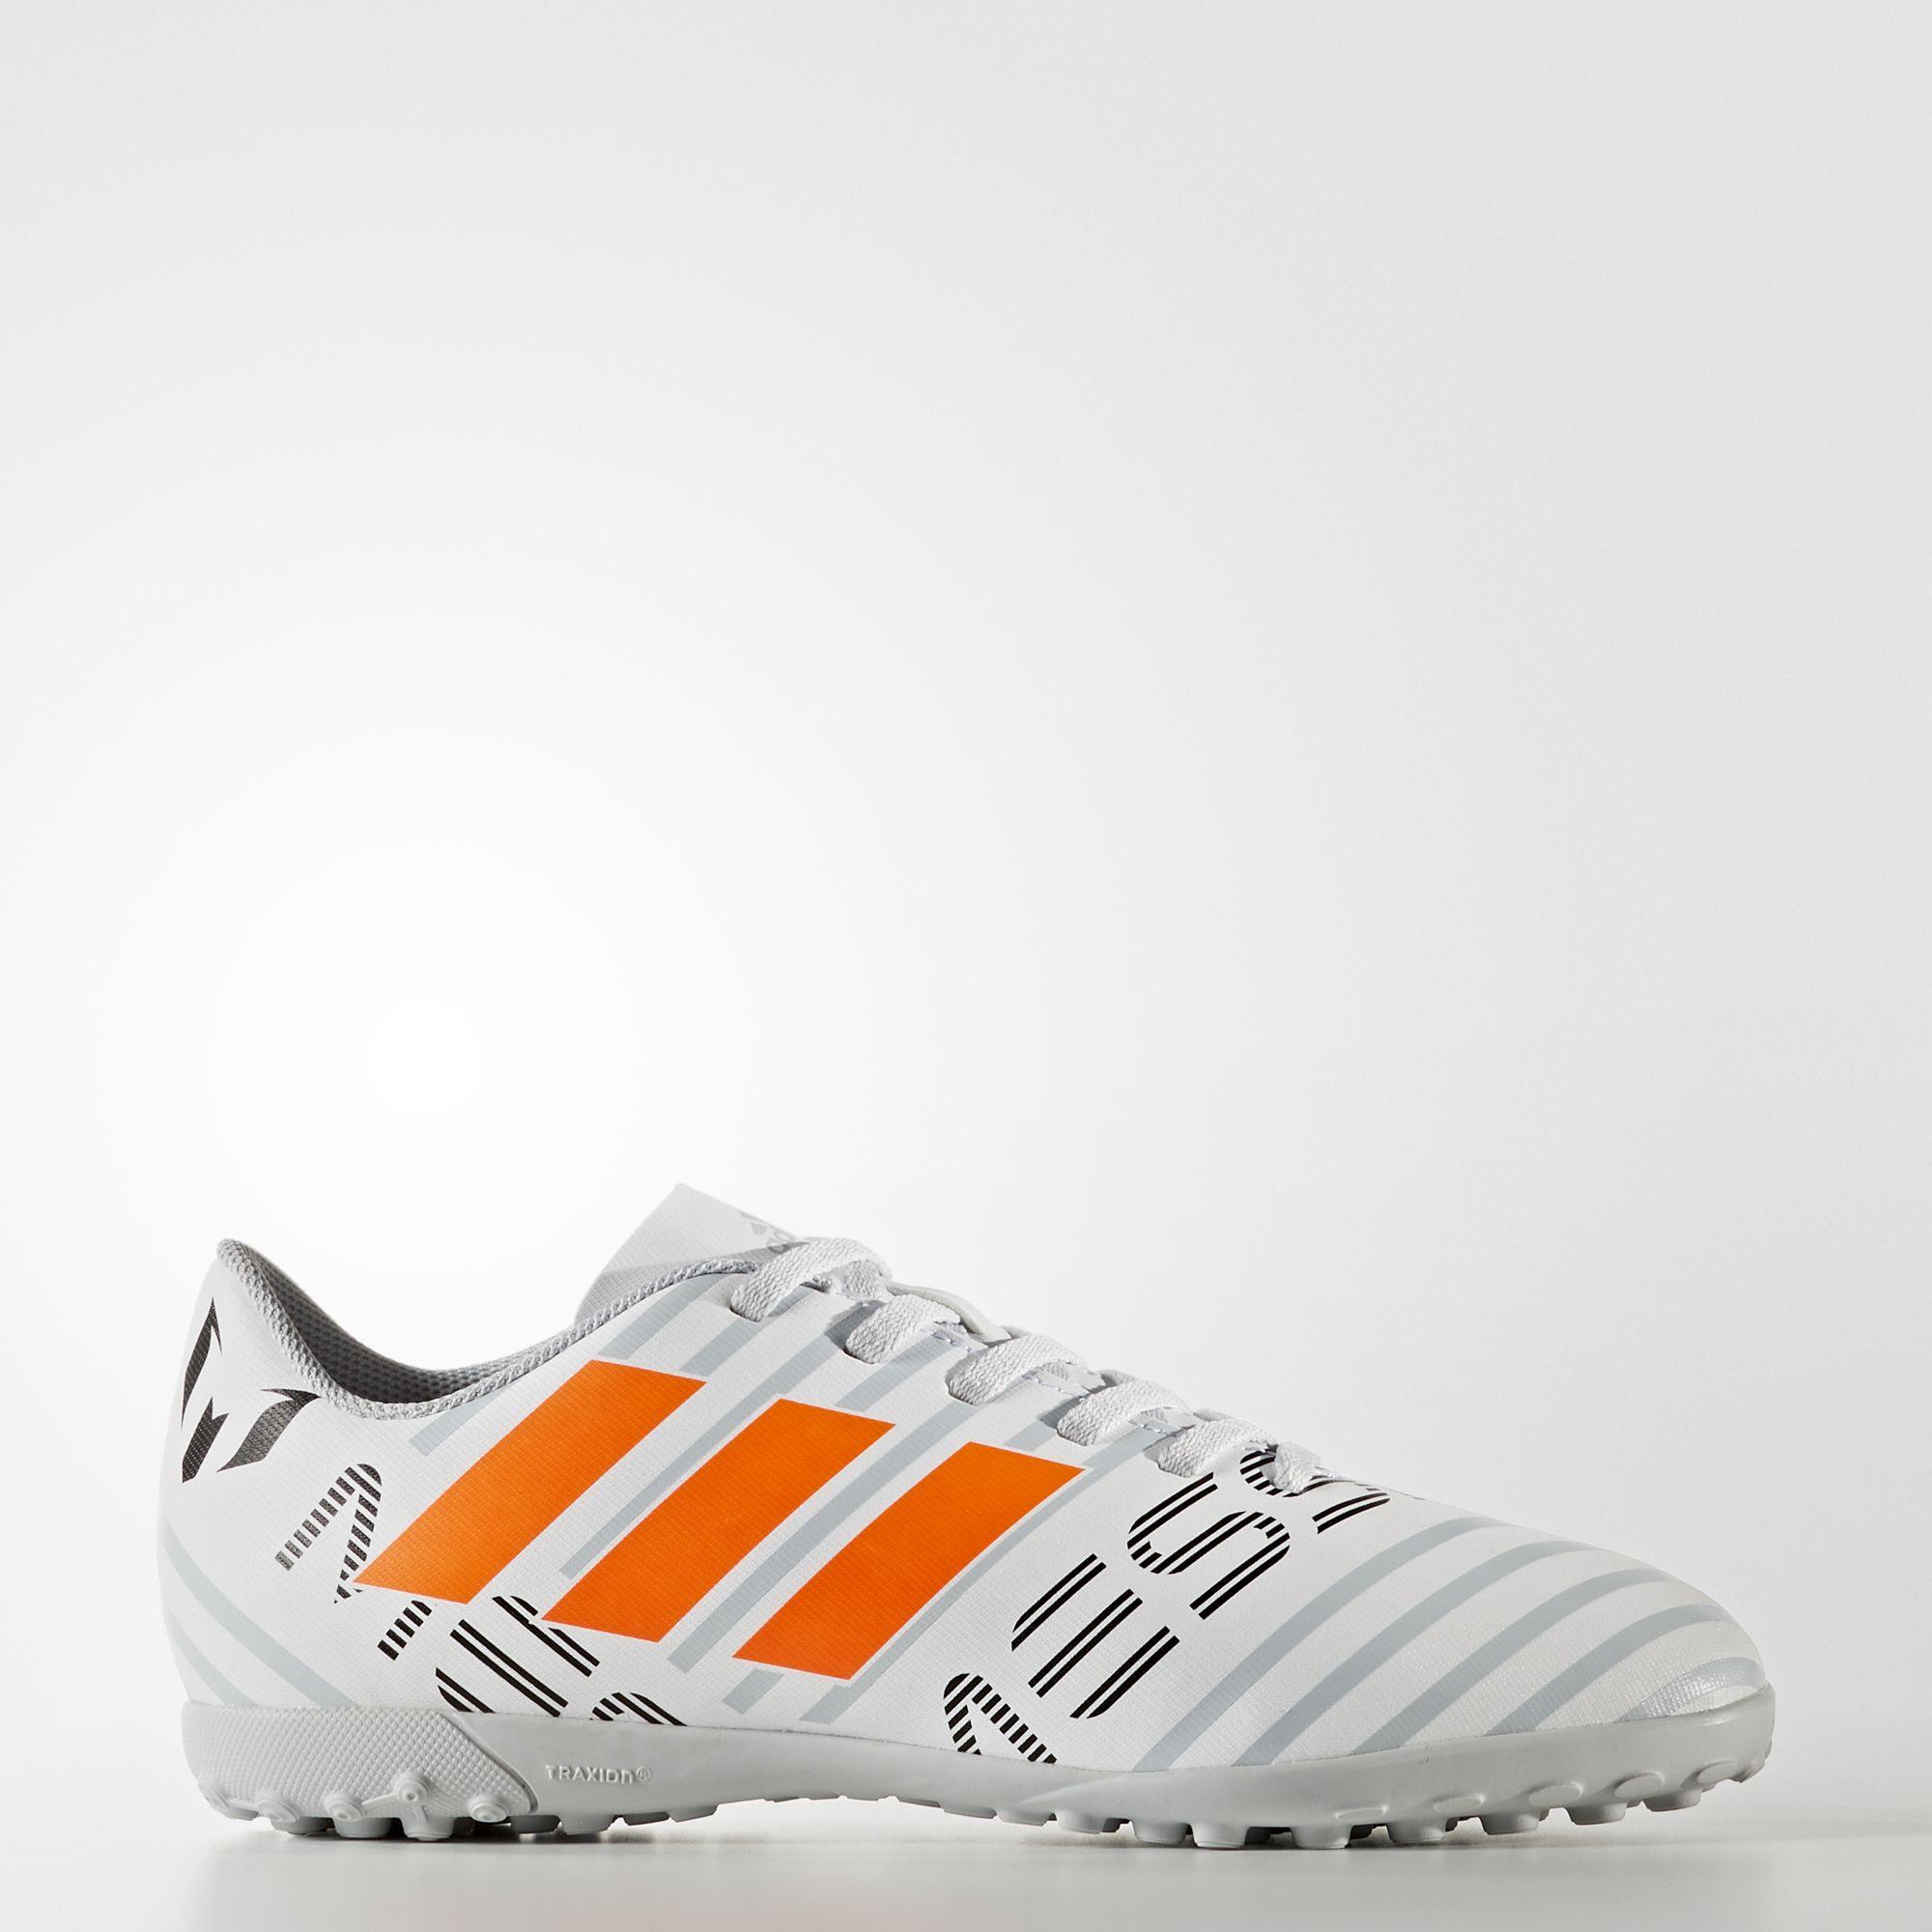 8c65849bbe1 Adidas Nemeziz Messi 17.4 TF